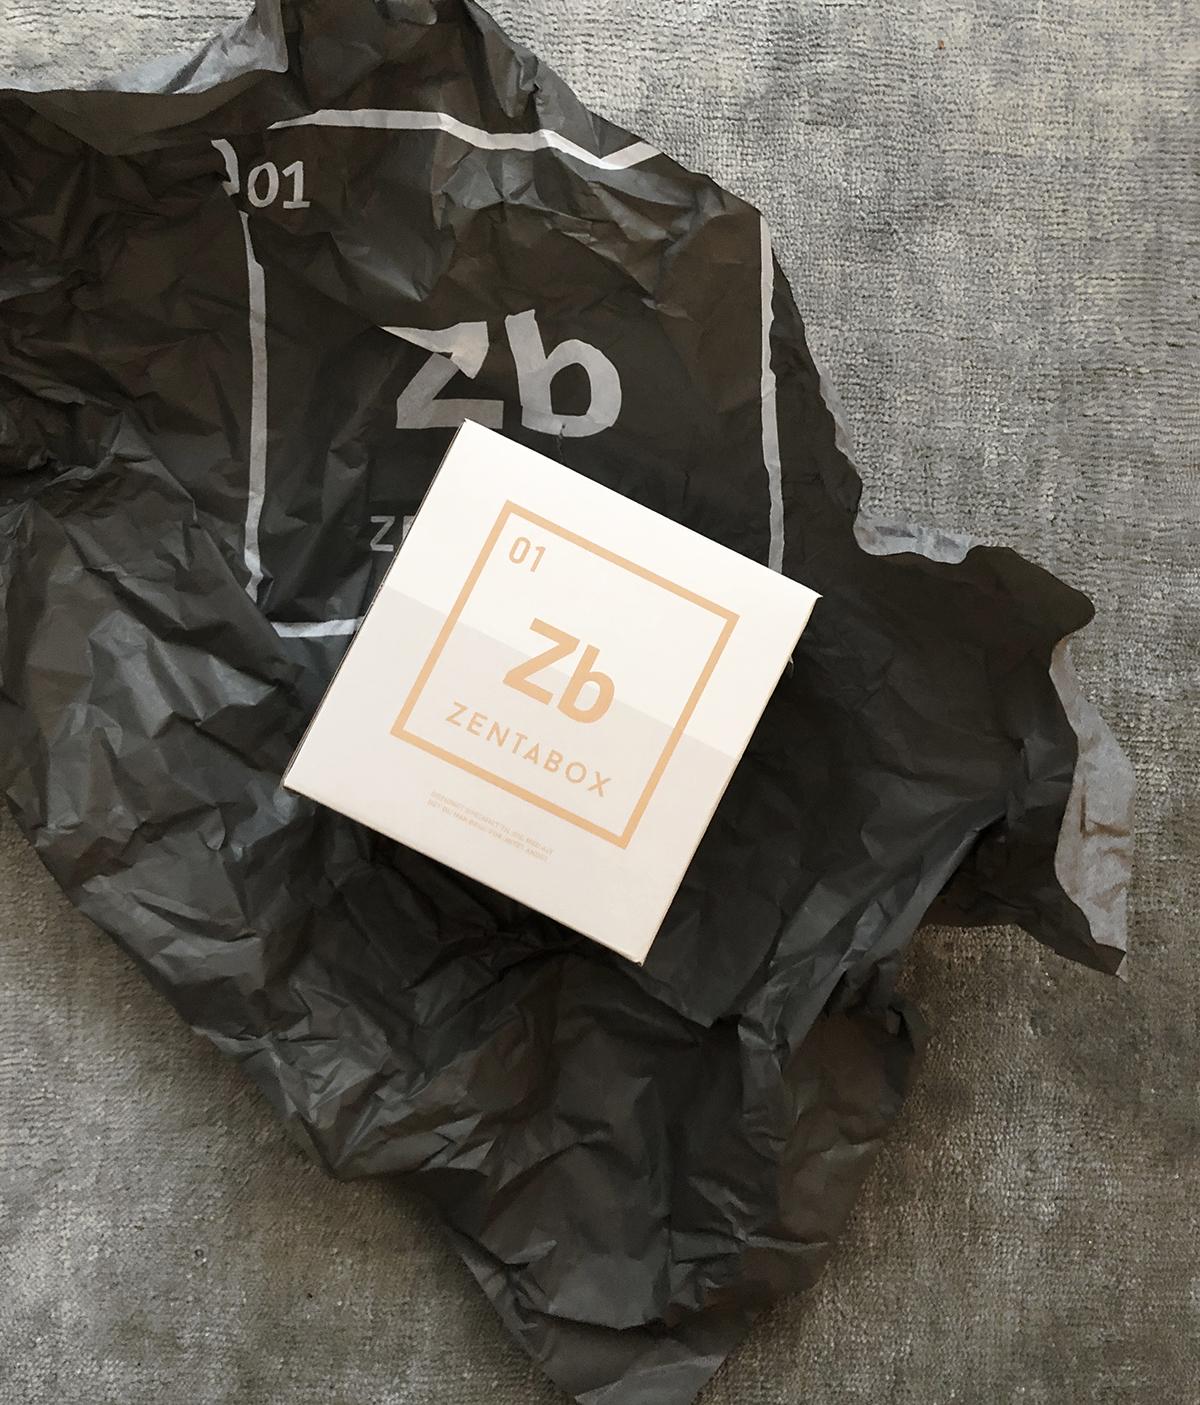 Zentabox_3.jpg